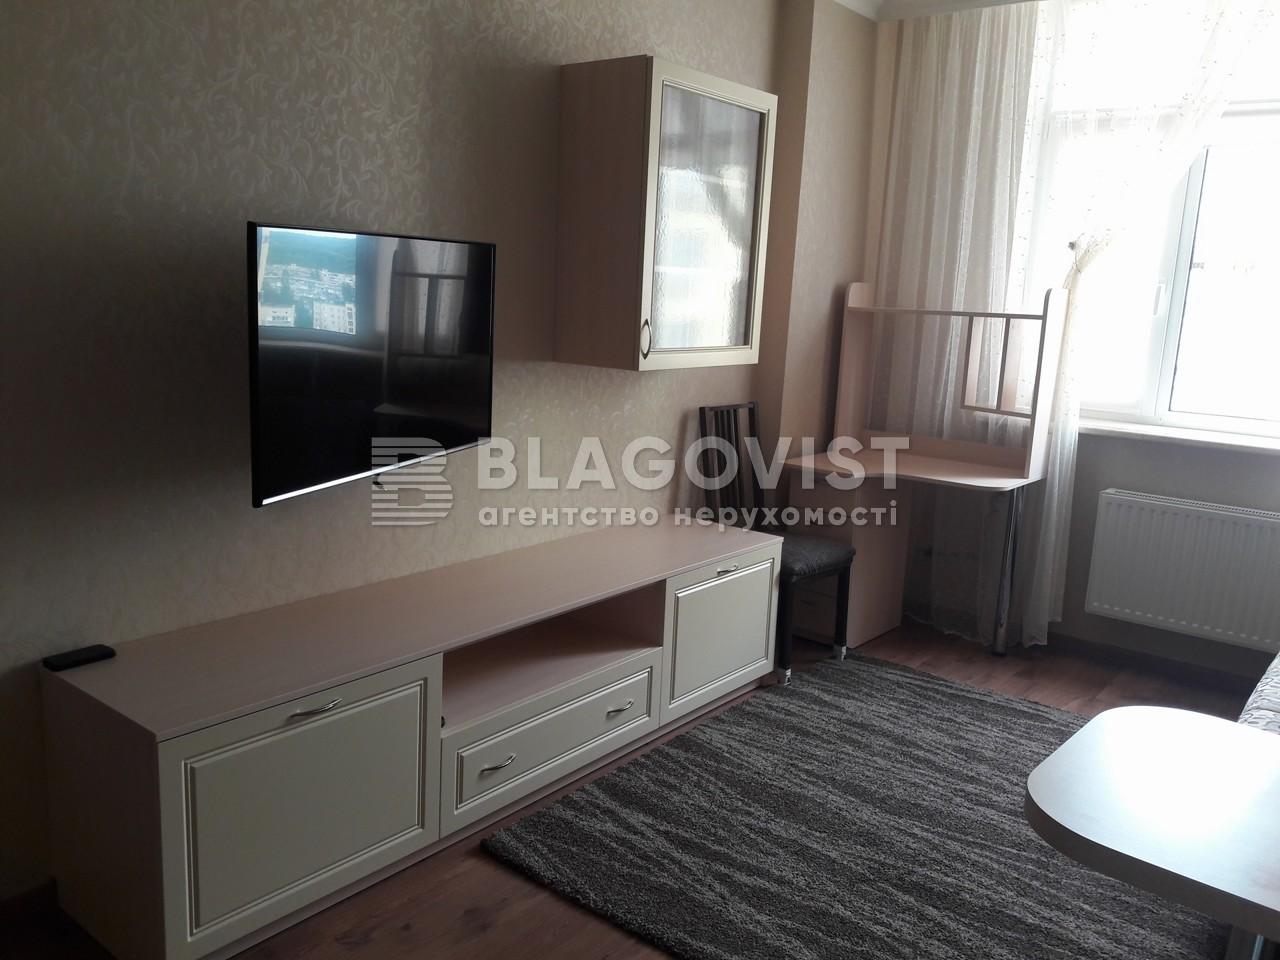 Квартира R-9631, Семьи Кульженко (Дегтяренко Петра), 35, Киев - Фото 7